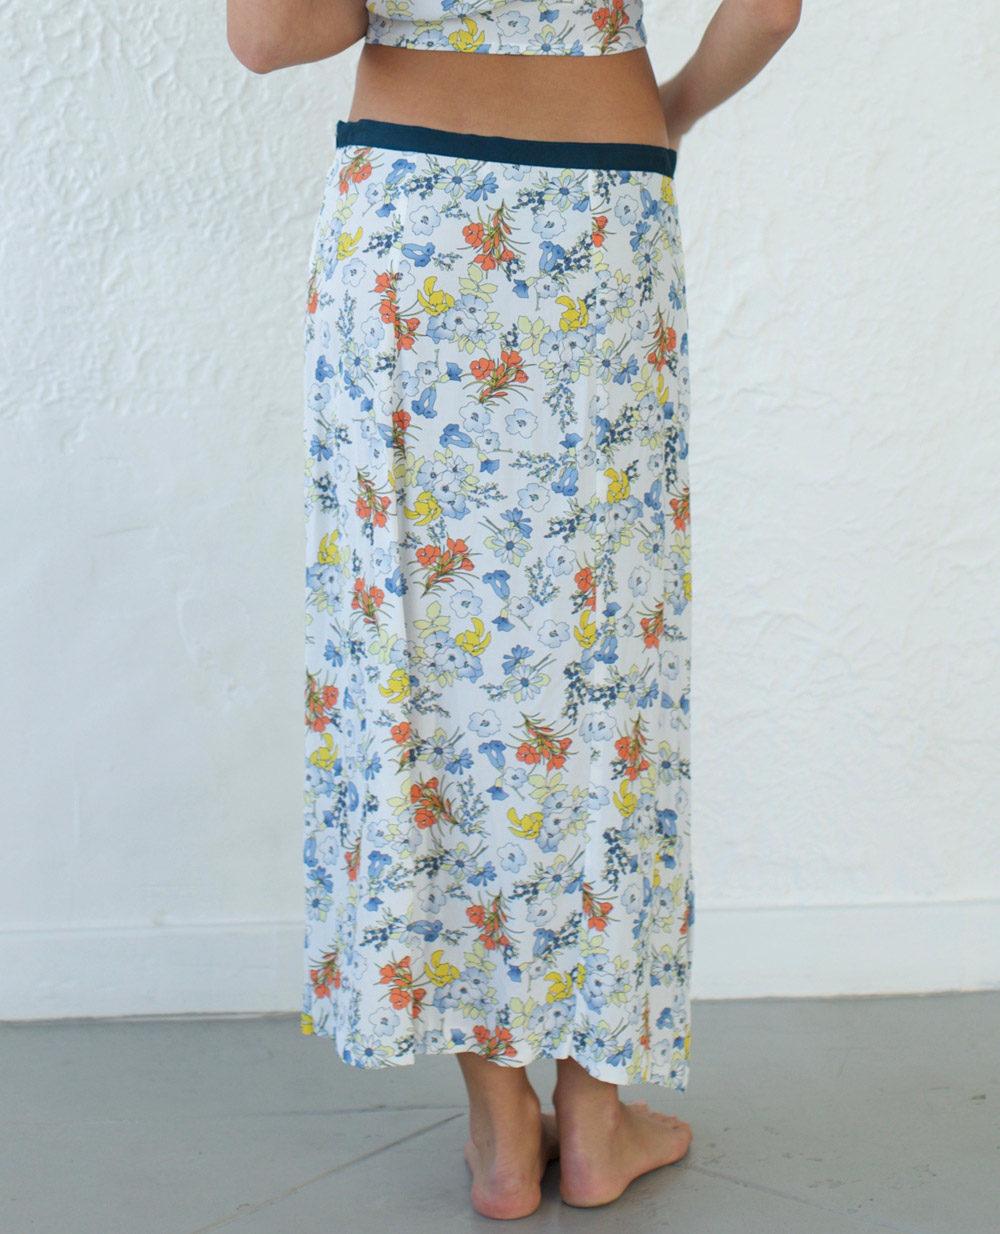 TheClothespinn.com Lilly Skirt Summerland Print